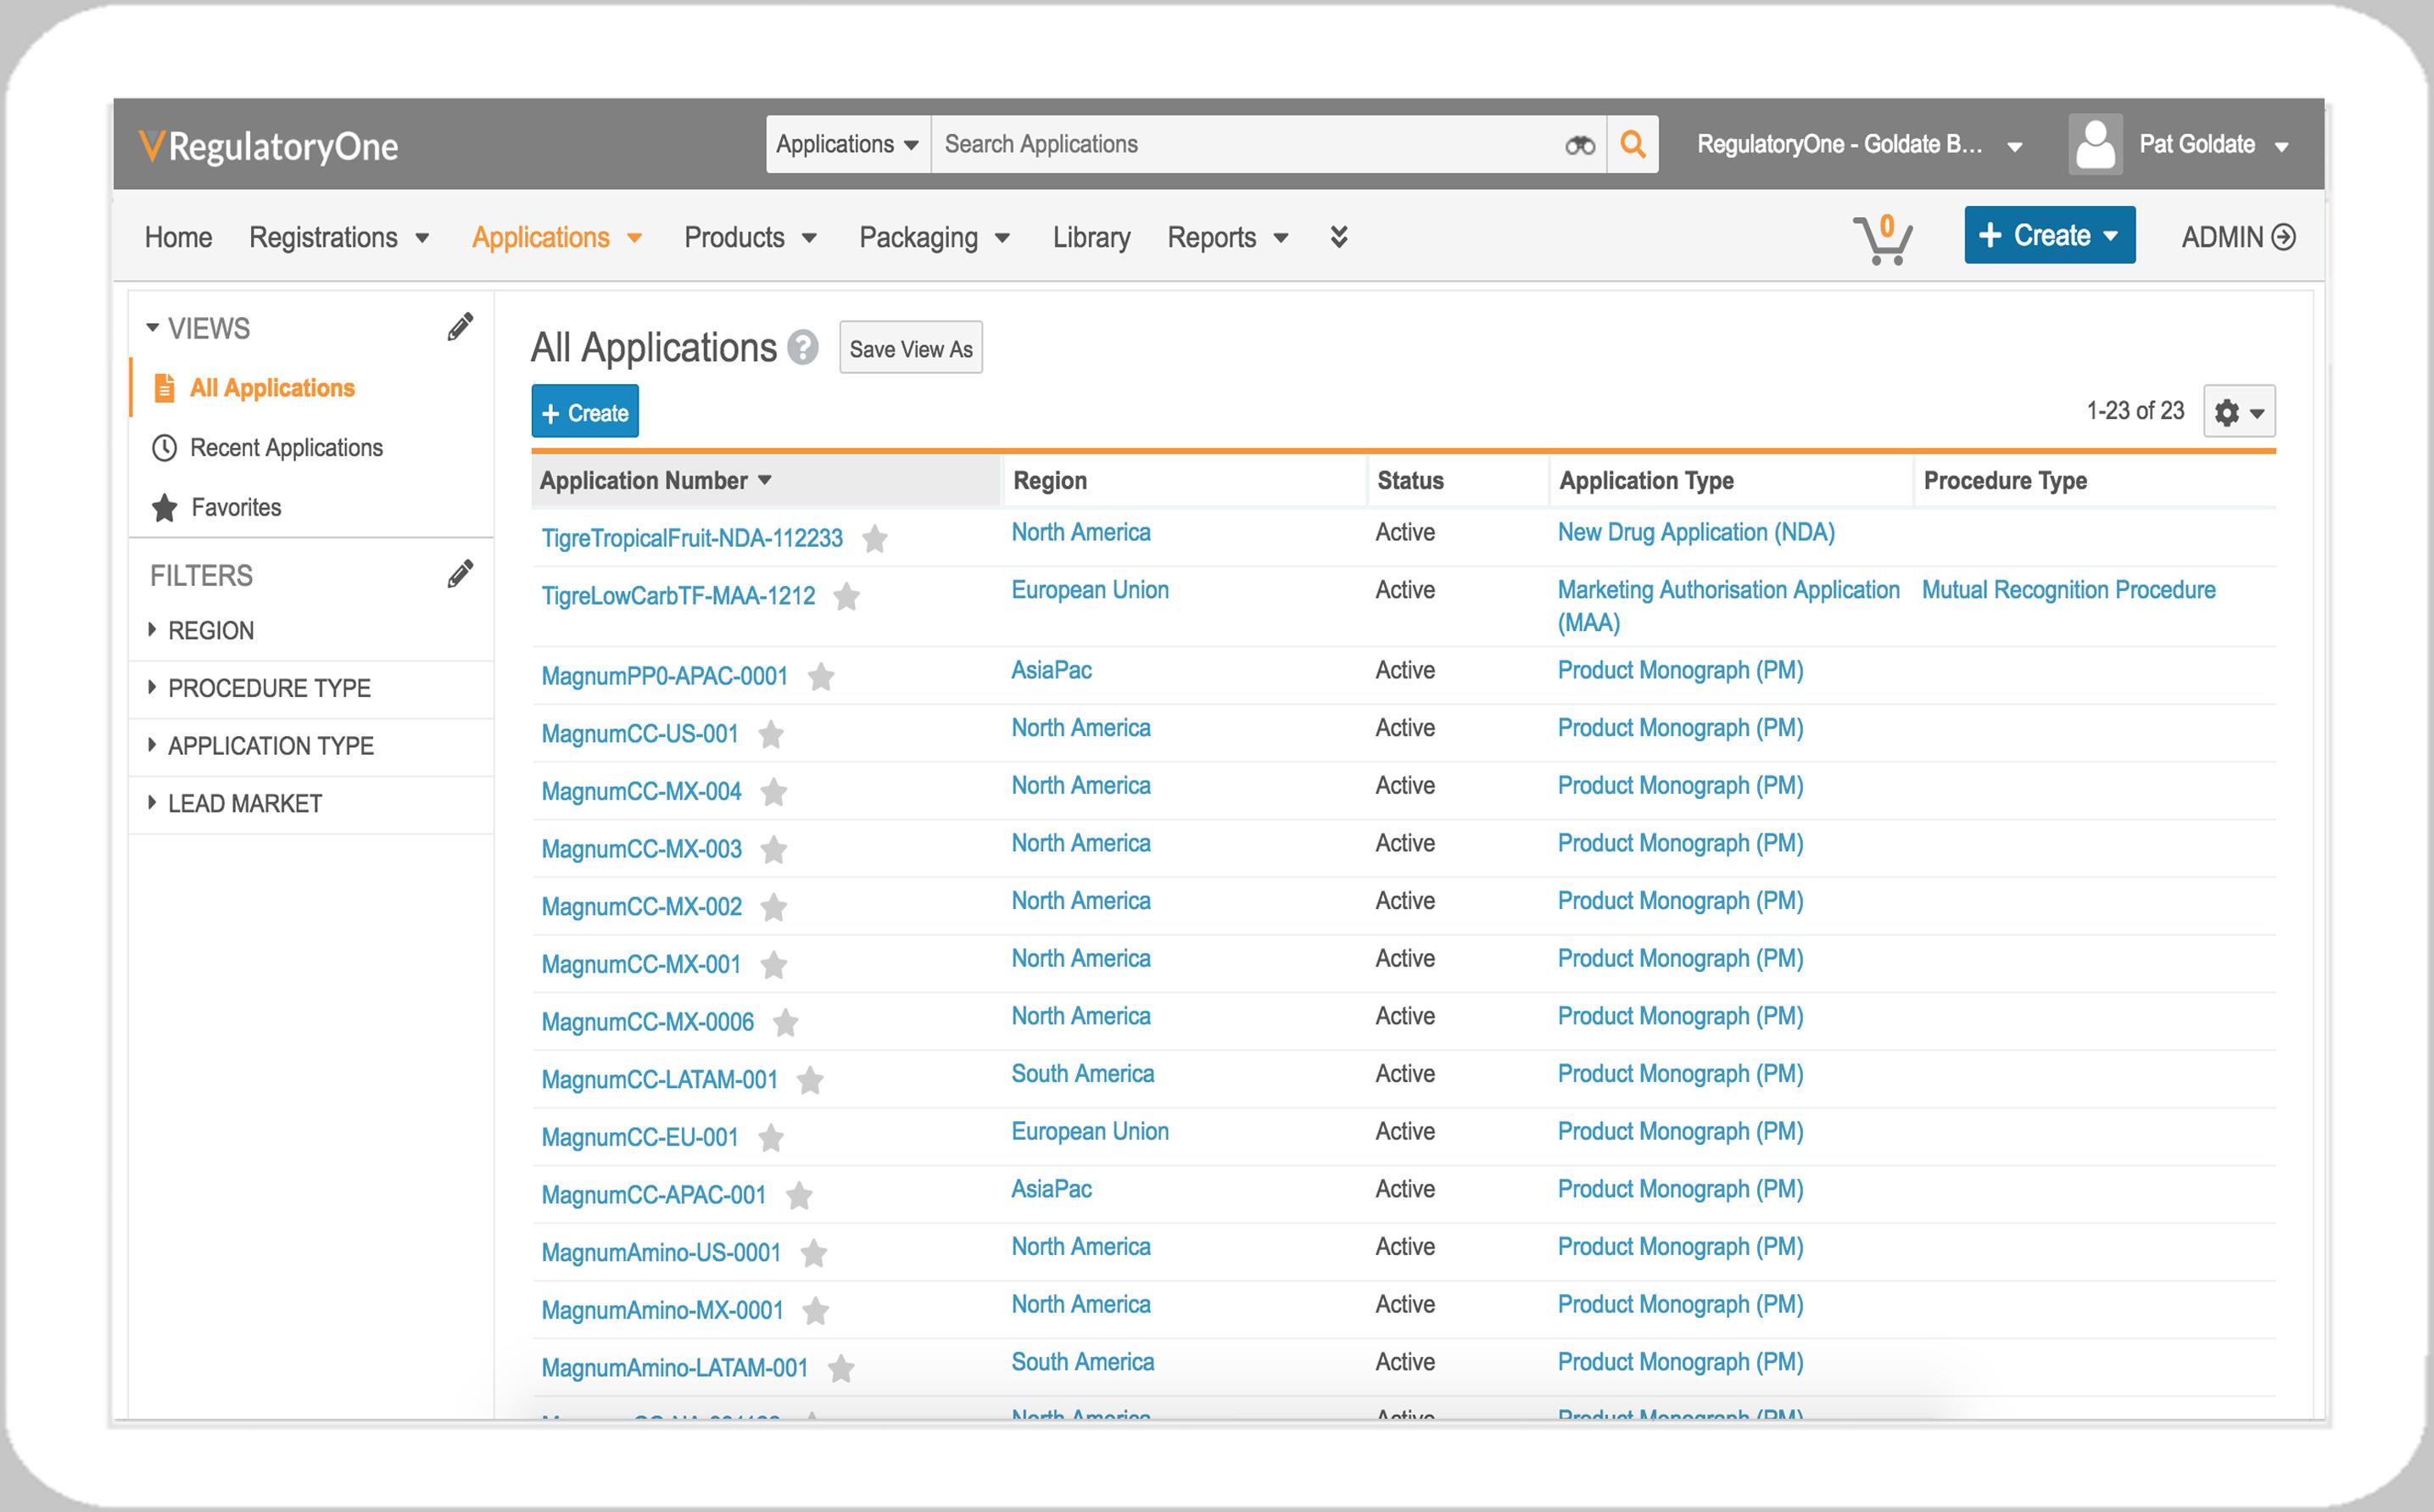 RegulatoryOne_All applications screen